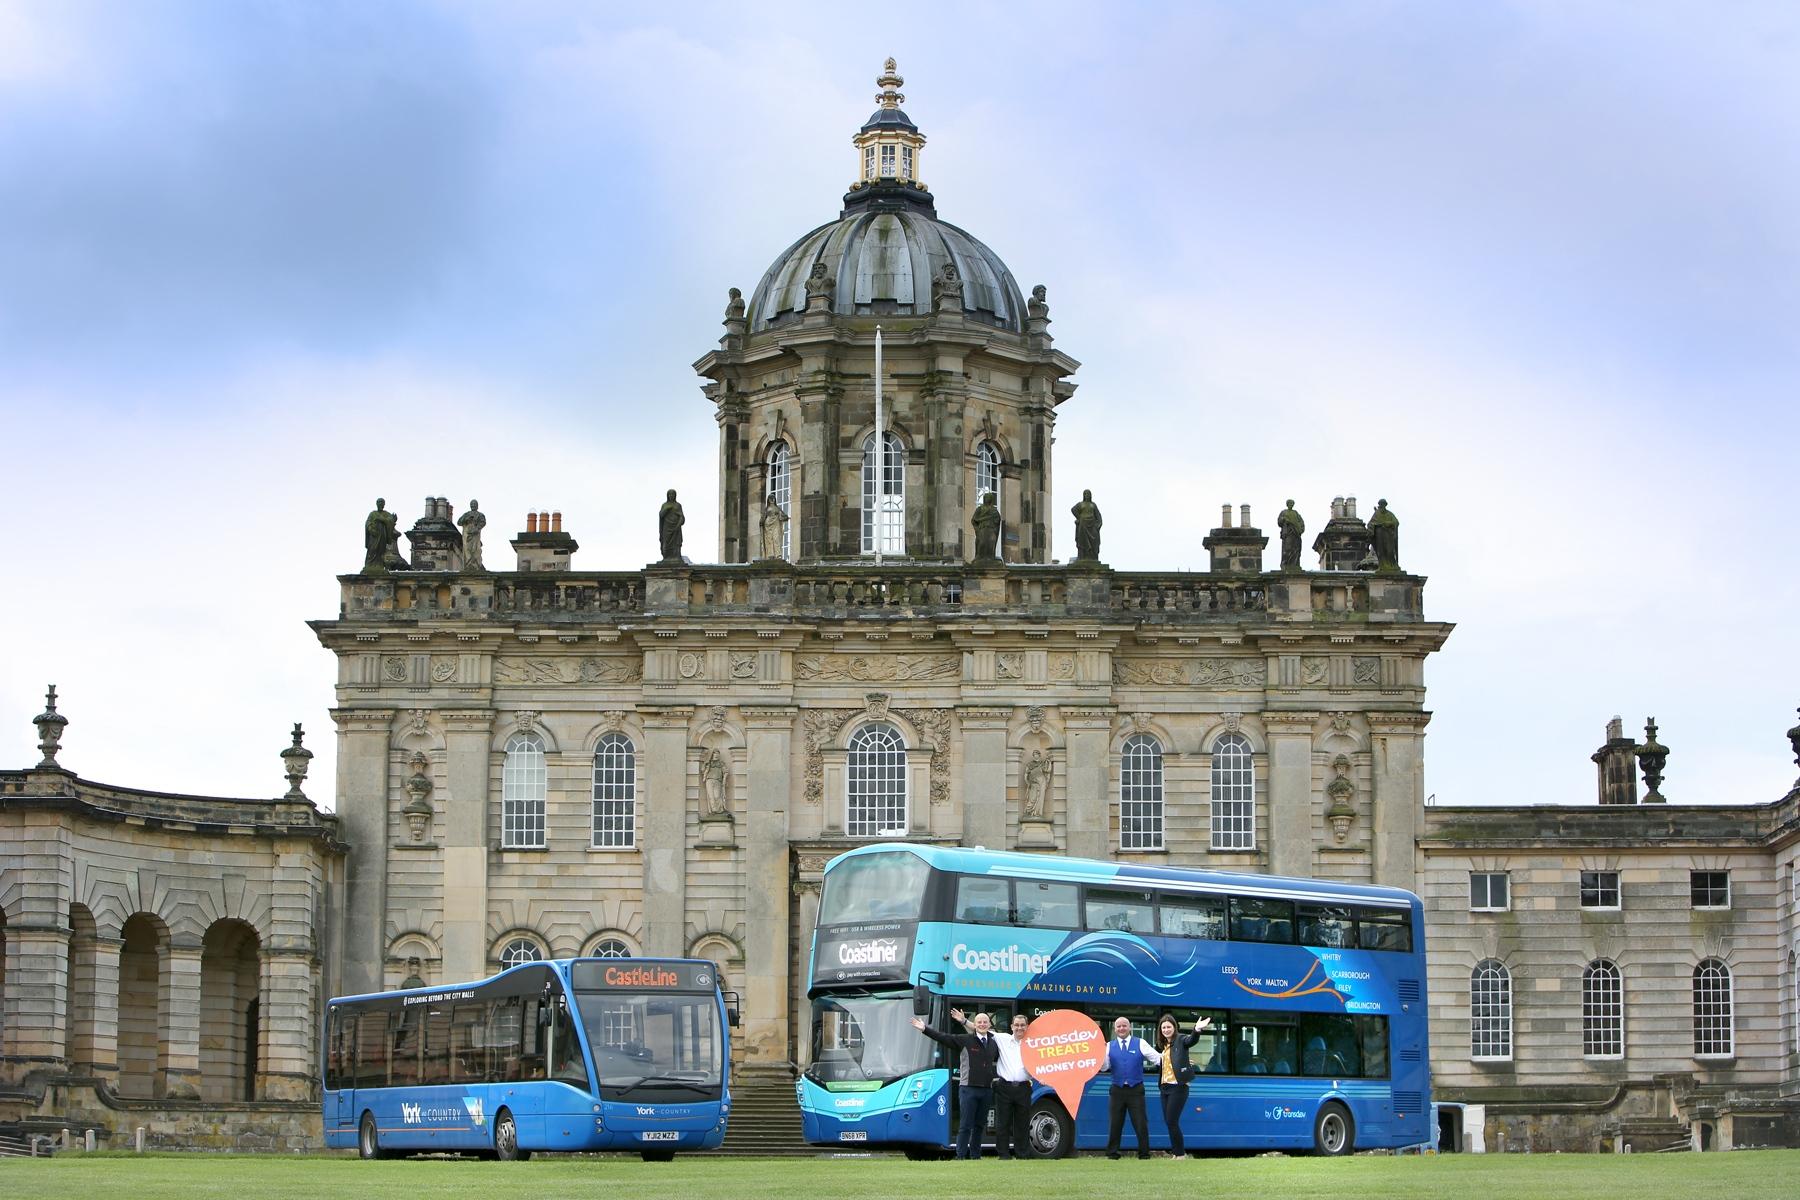 #AYearOfBuses 181: CastleLine York – Malton